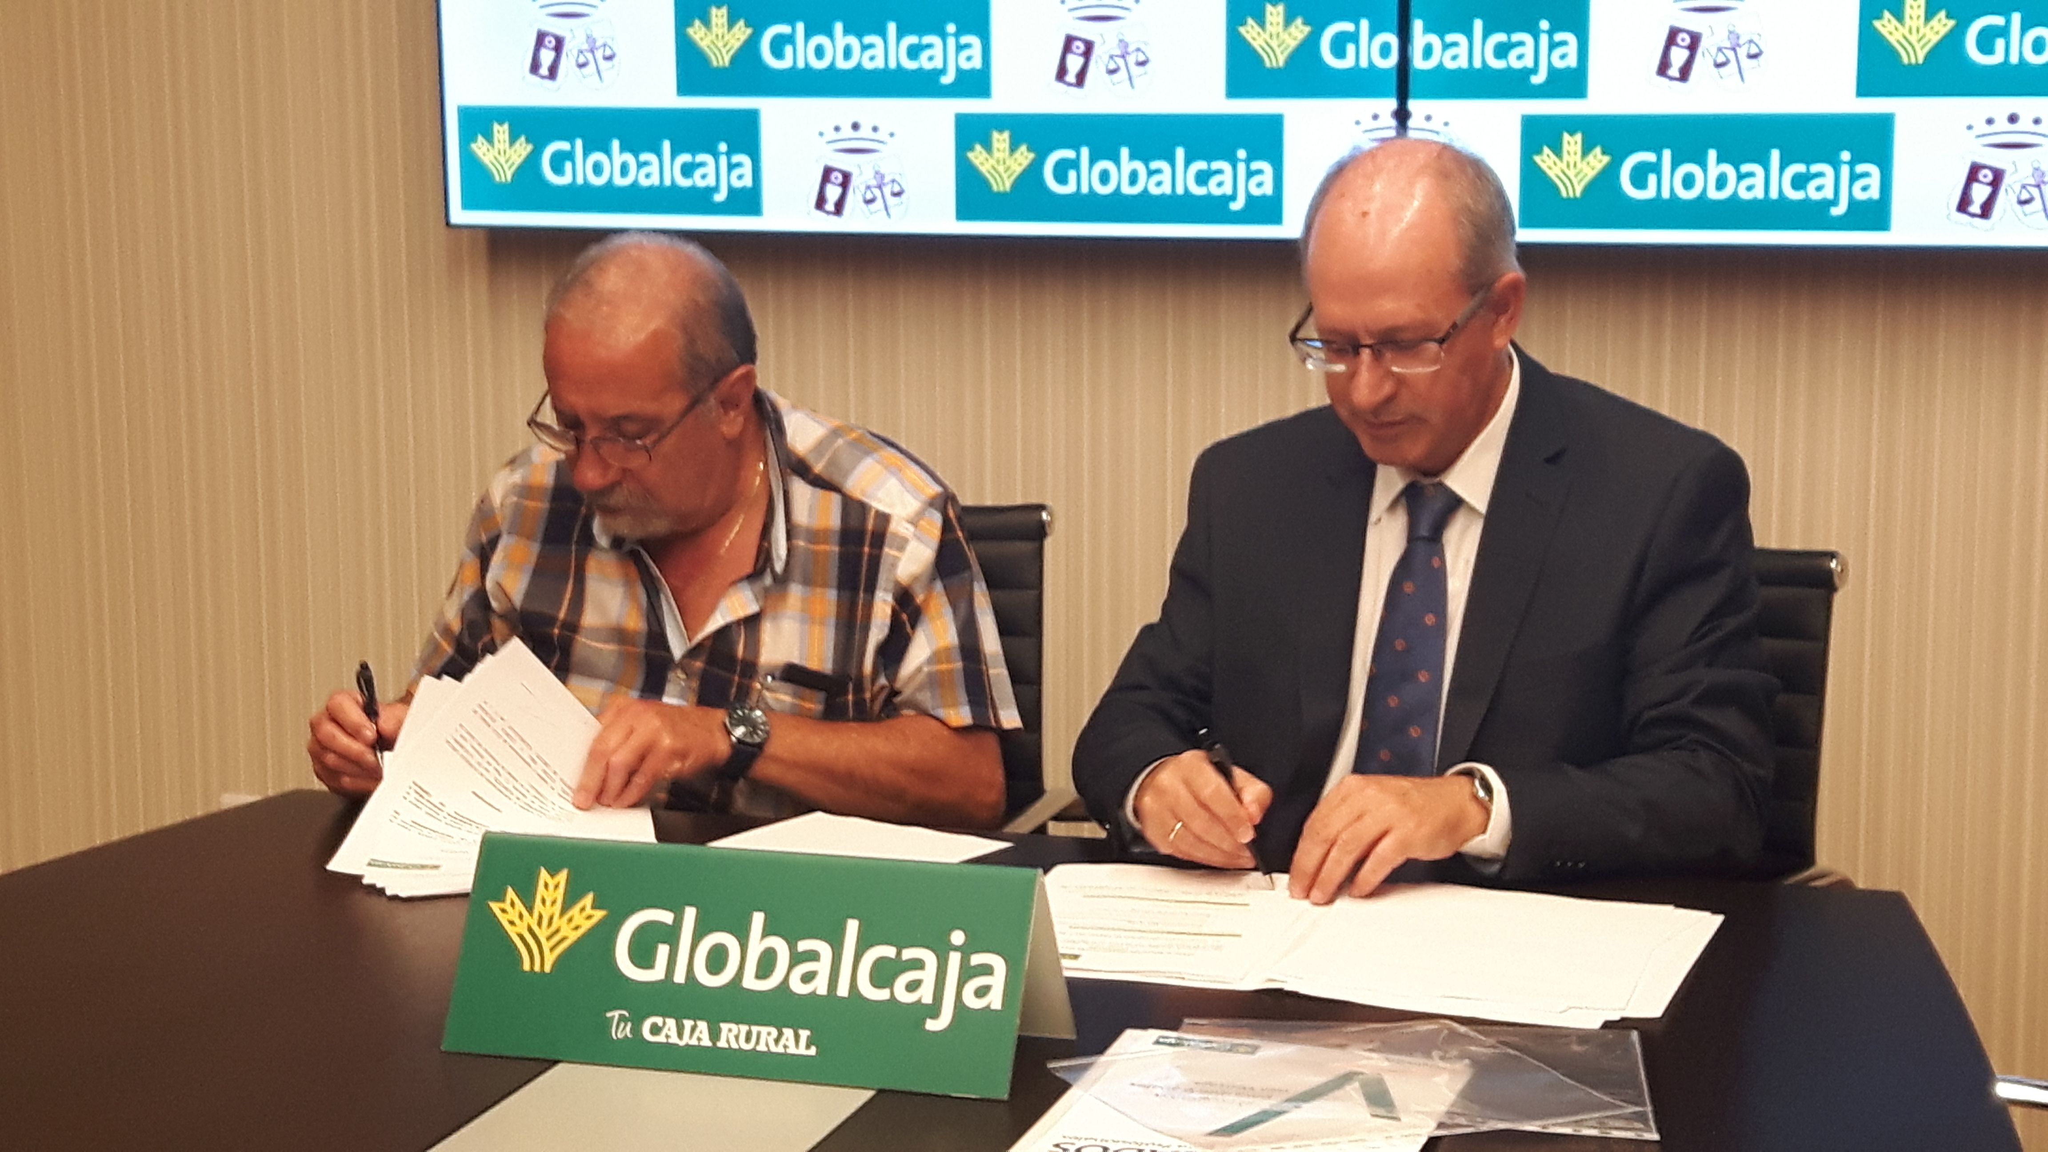 https://blog.globalcaja.es/wp-content/uploads/2017/07/foto-firma-convenio-regional-procuradores.jpg